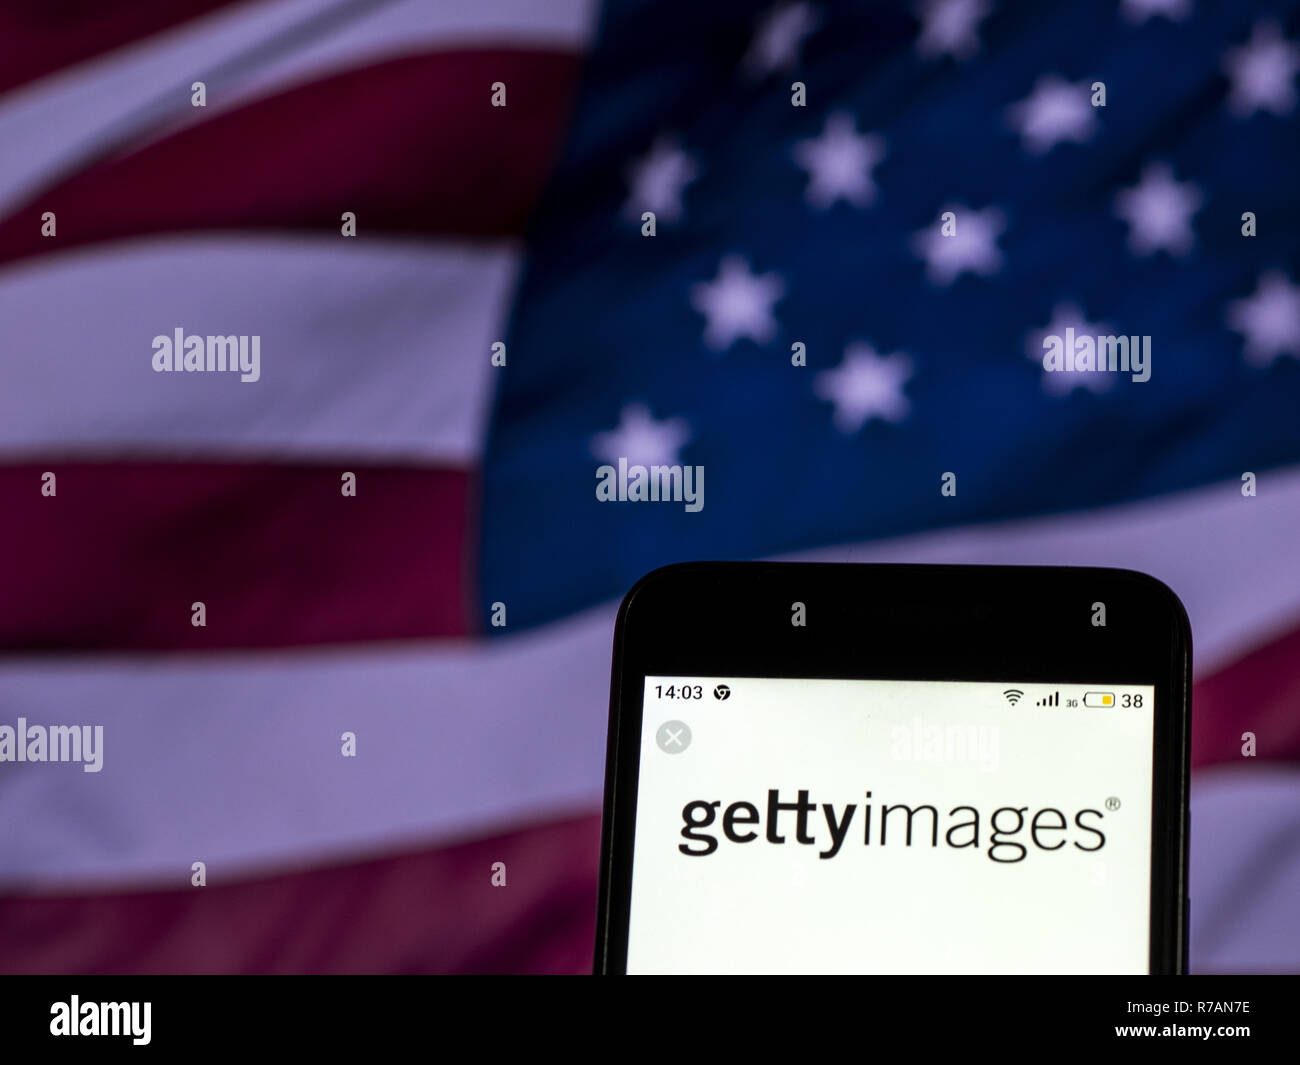 Kiev, Ukraine. 7th Dec, 2018. Getty Images Media company logo seen displayed on smart phone. Credit: Igor Golovniov/SOPA Images/ZUMA Wire/Alamy Live News - Stock Image